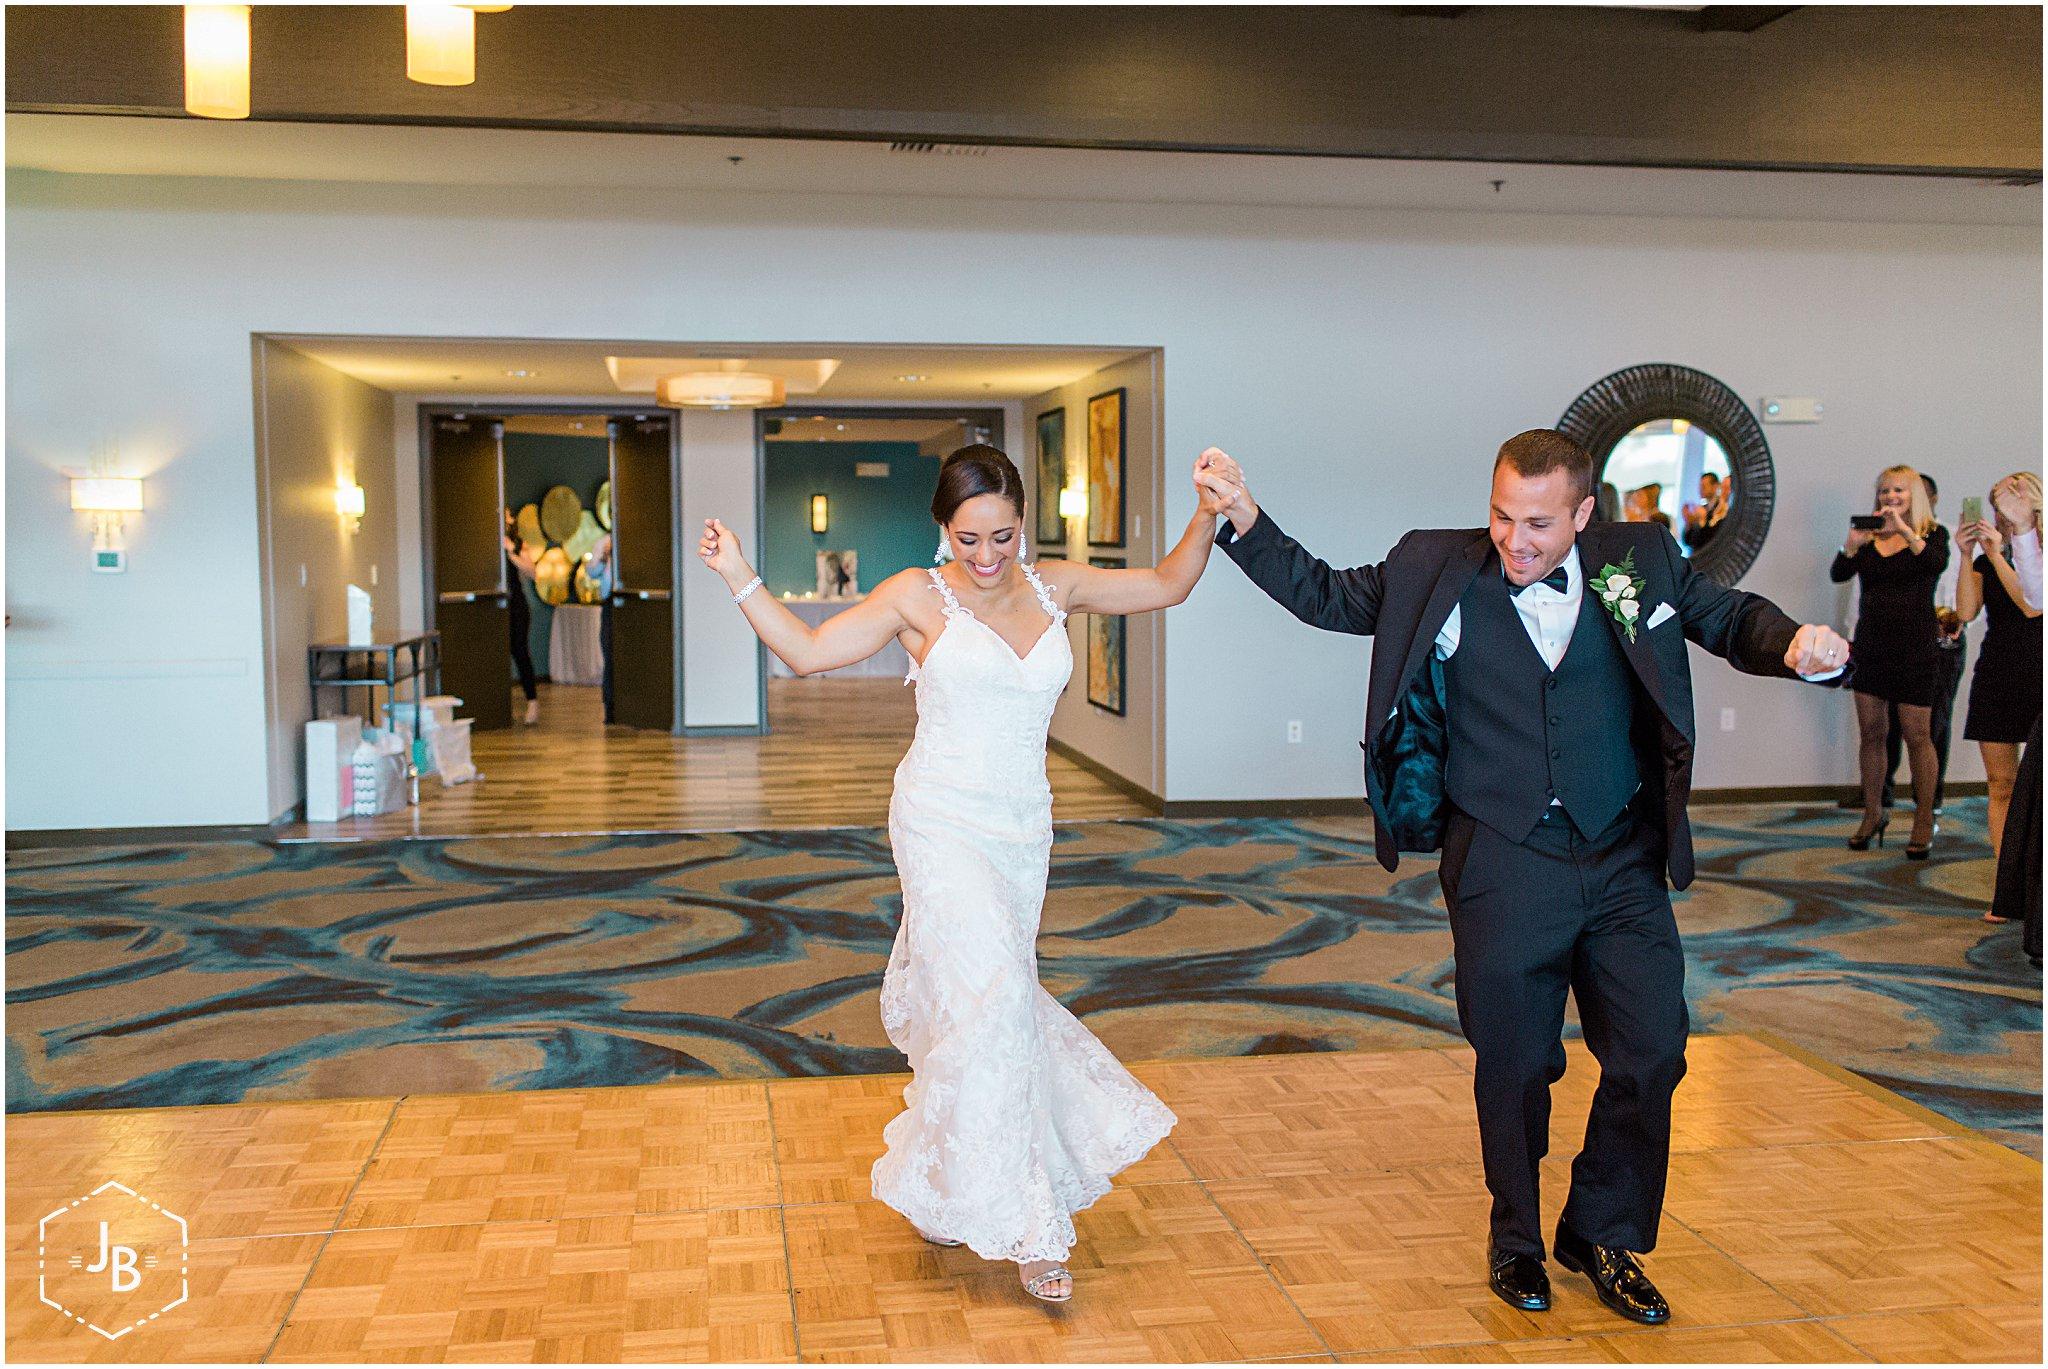 WeddingandEngagementFloridaPhotographer_0270.jpg